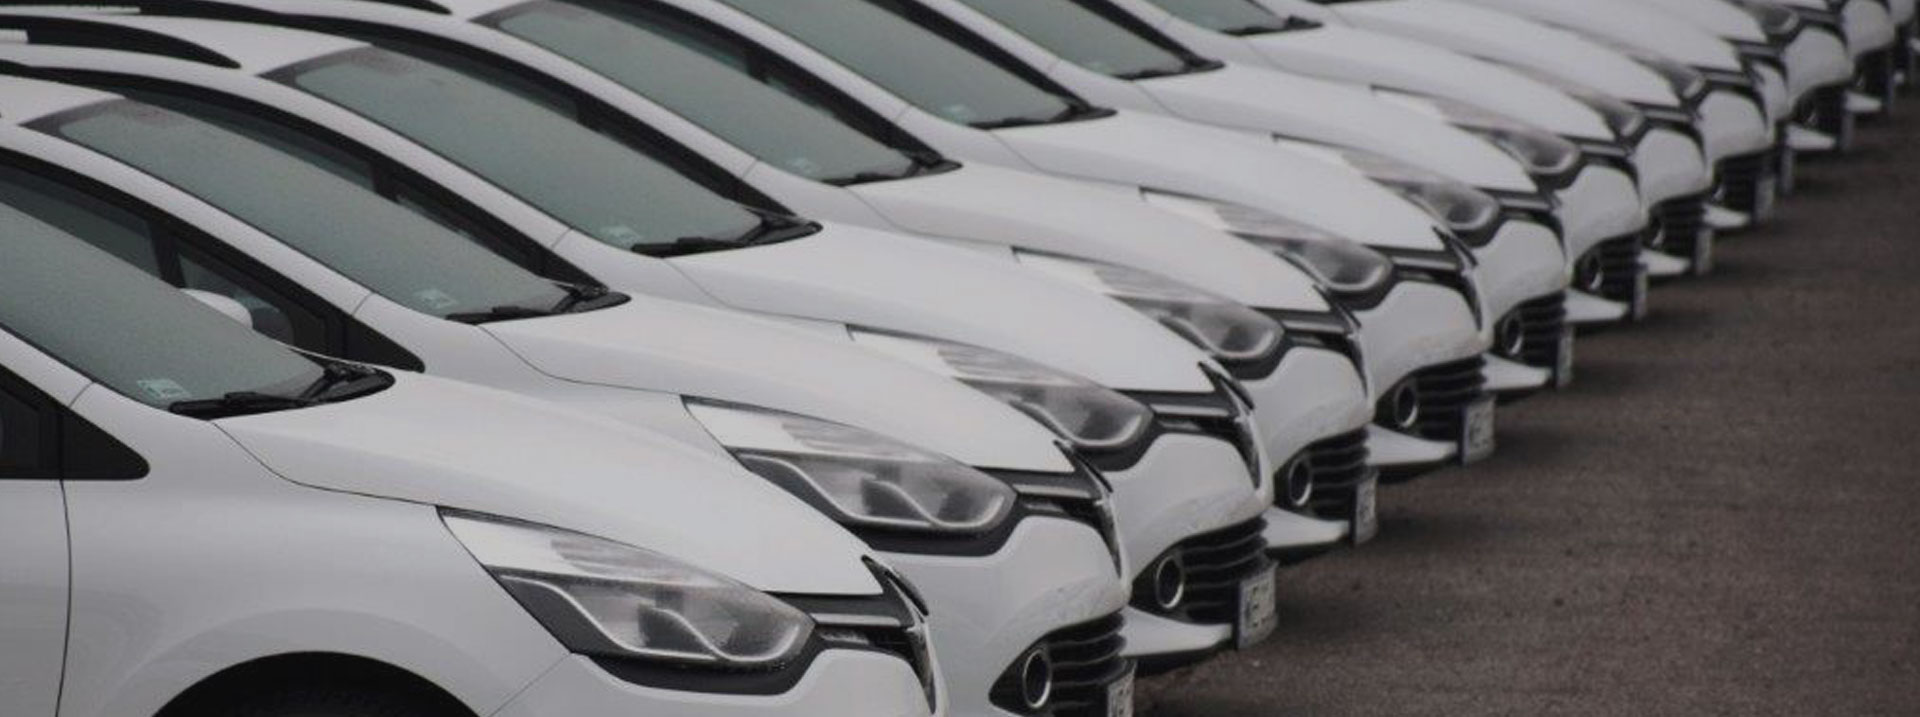 Vehicle fleet services